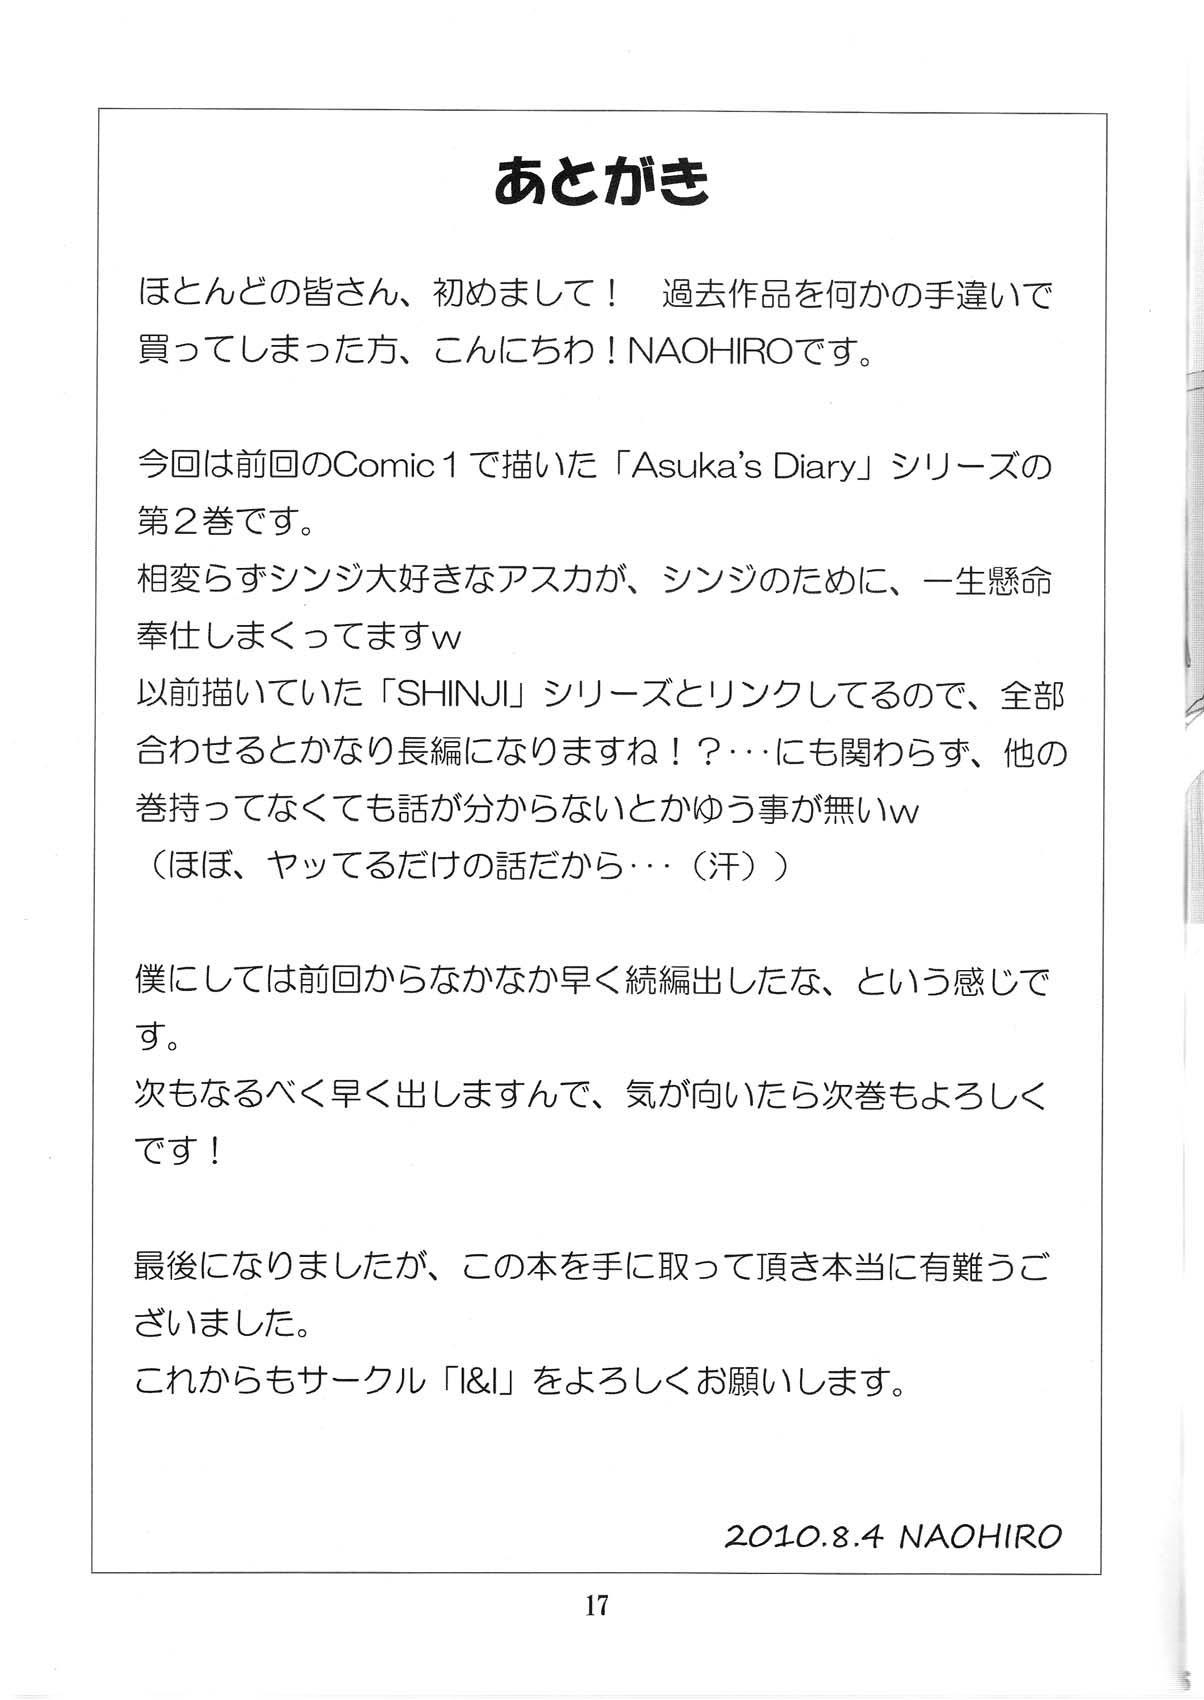 Asuka's Diary 2 16